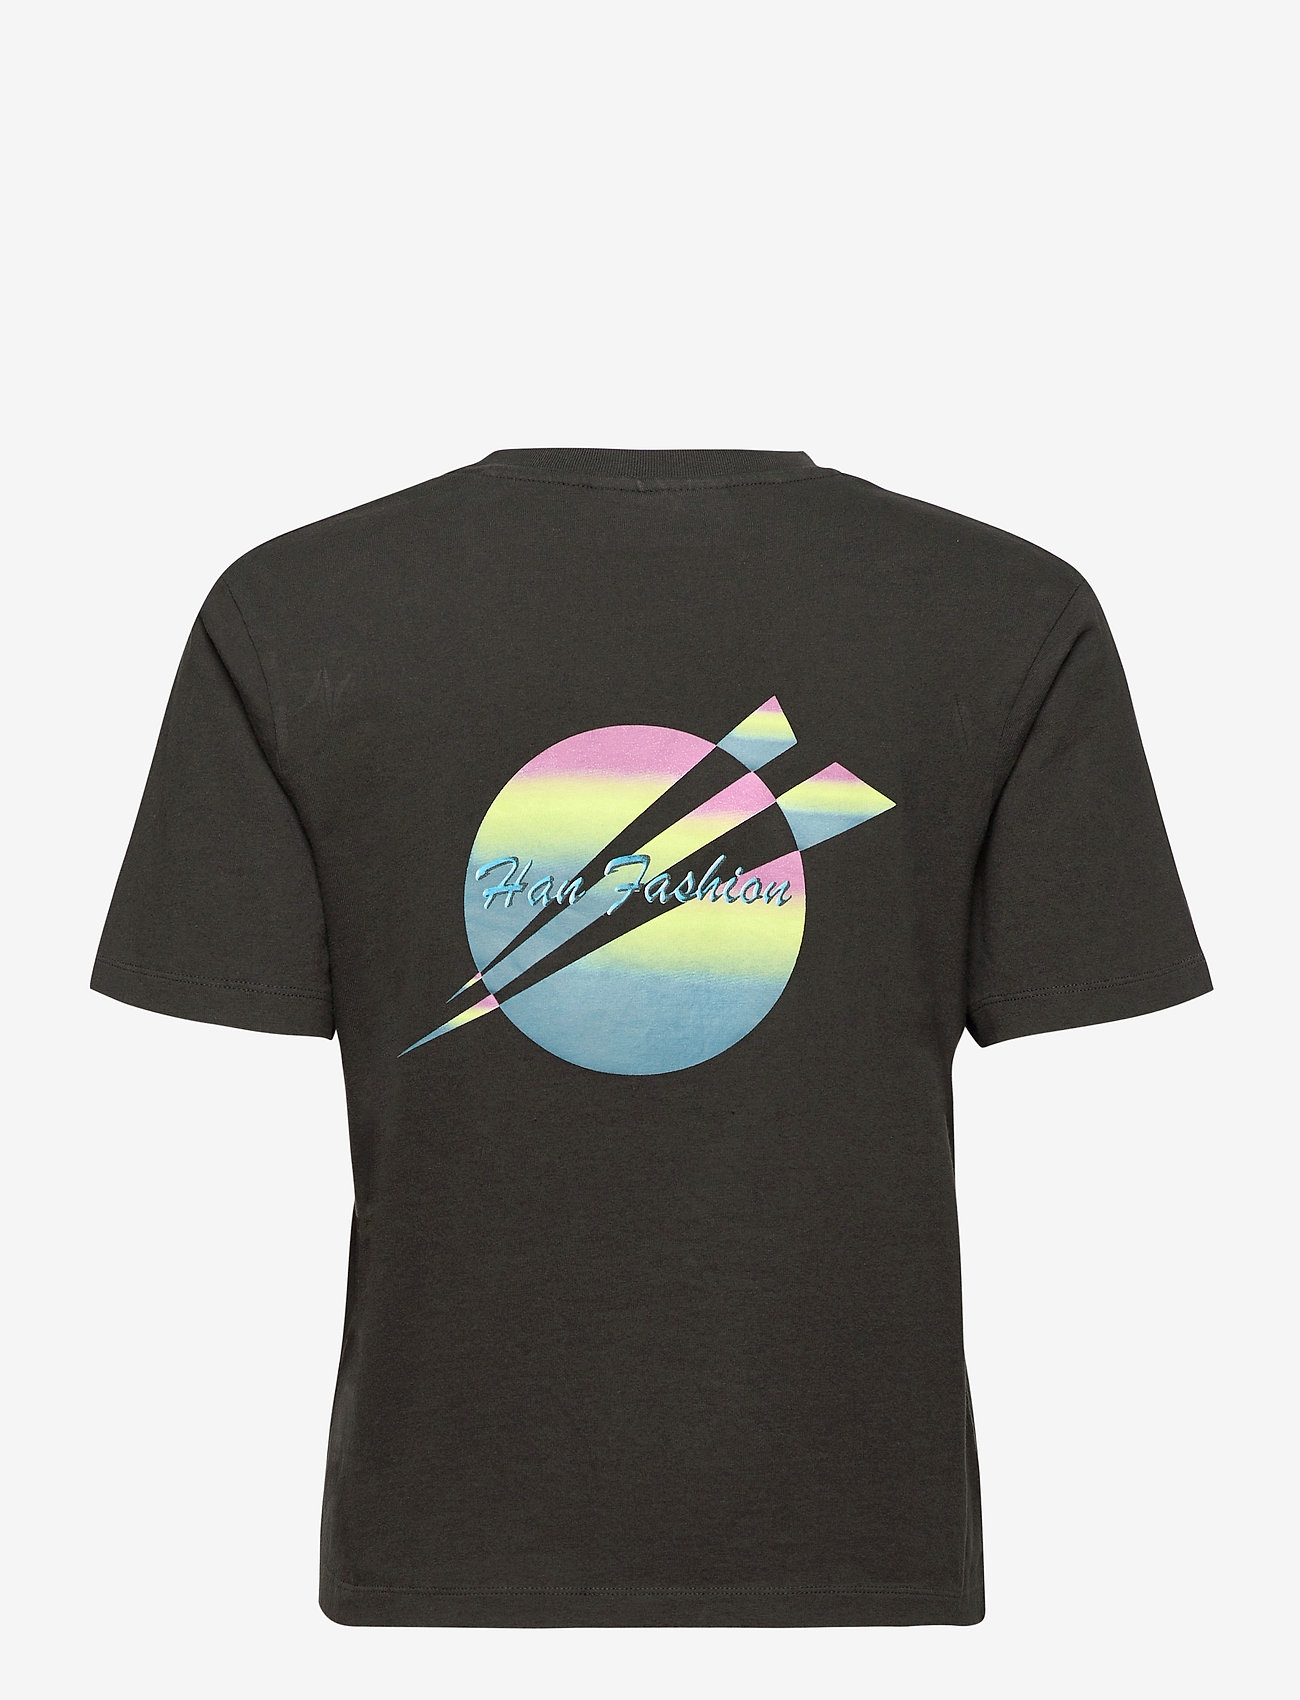 HAN Kjøbenhavn - Artwork Tee - t-shirts - faded black - 1